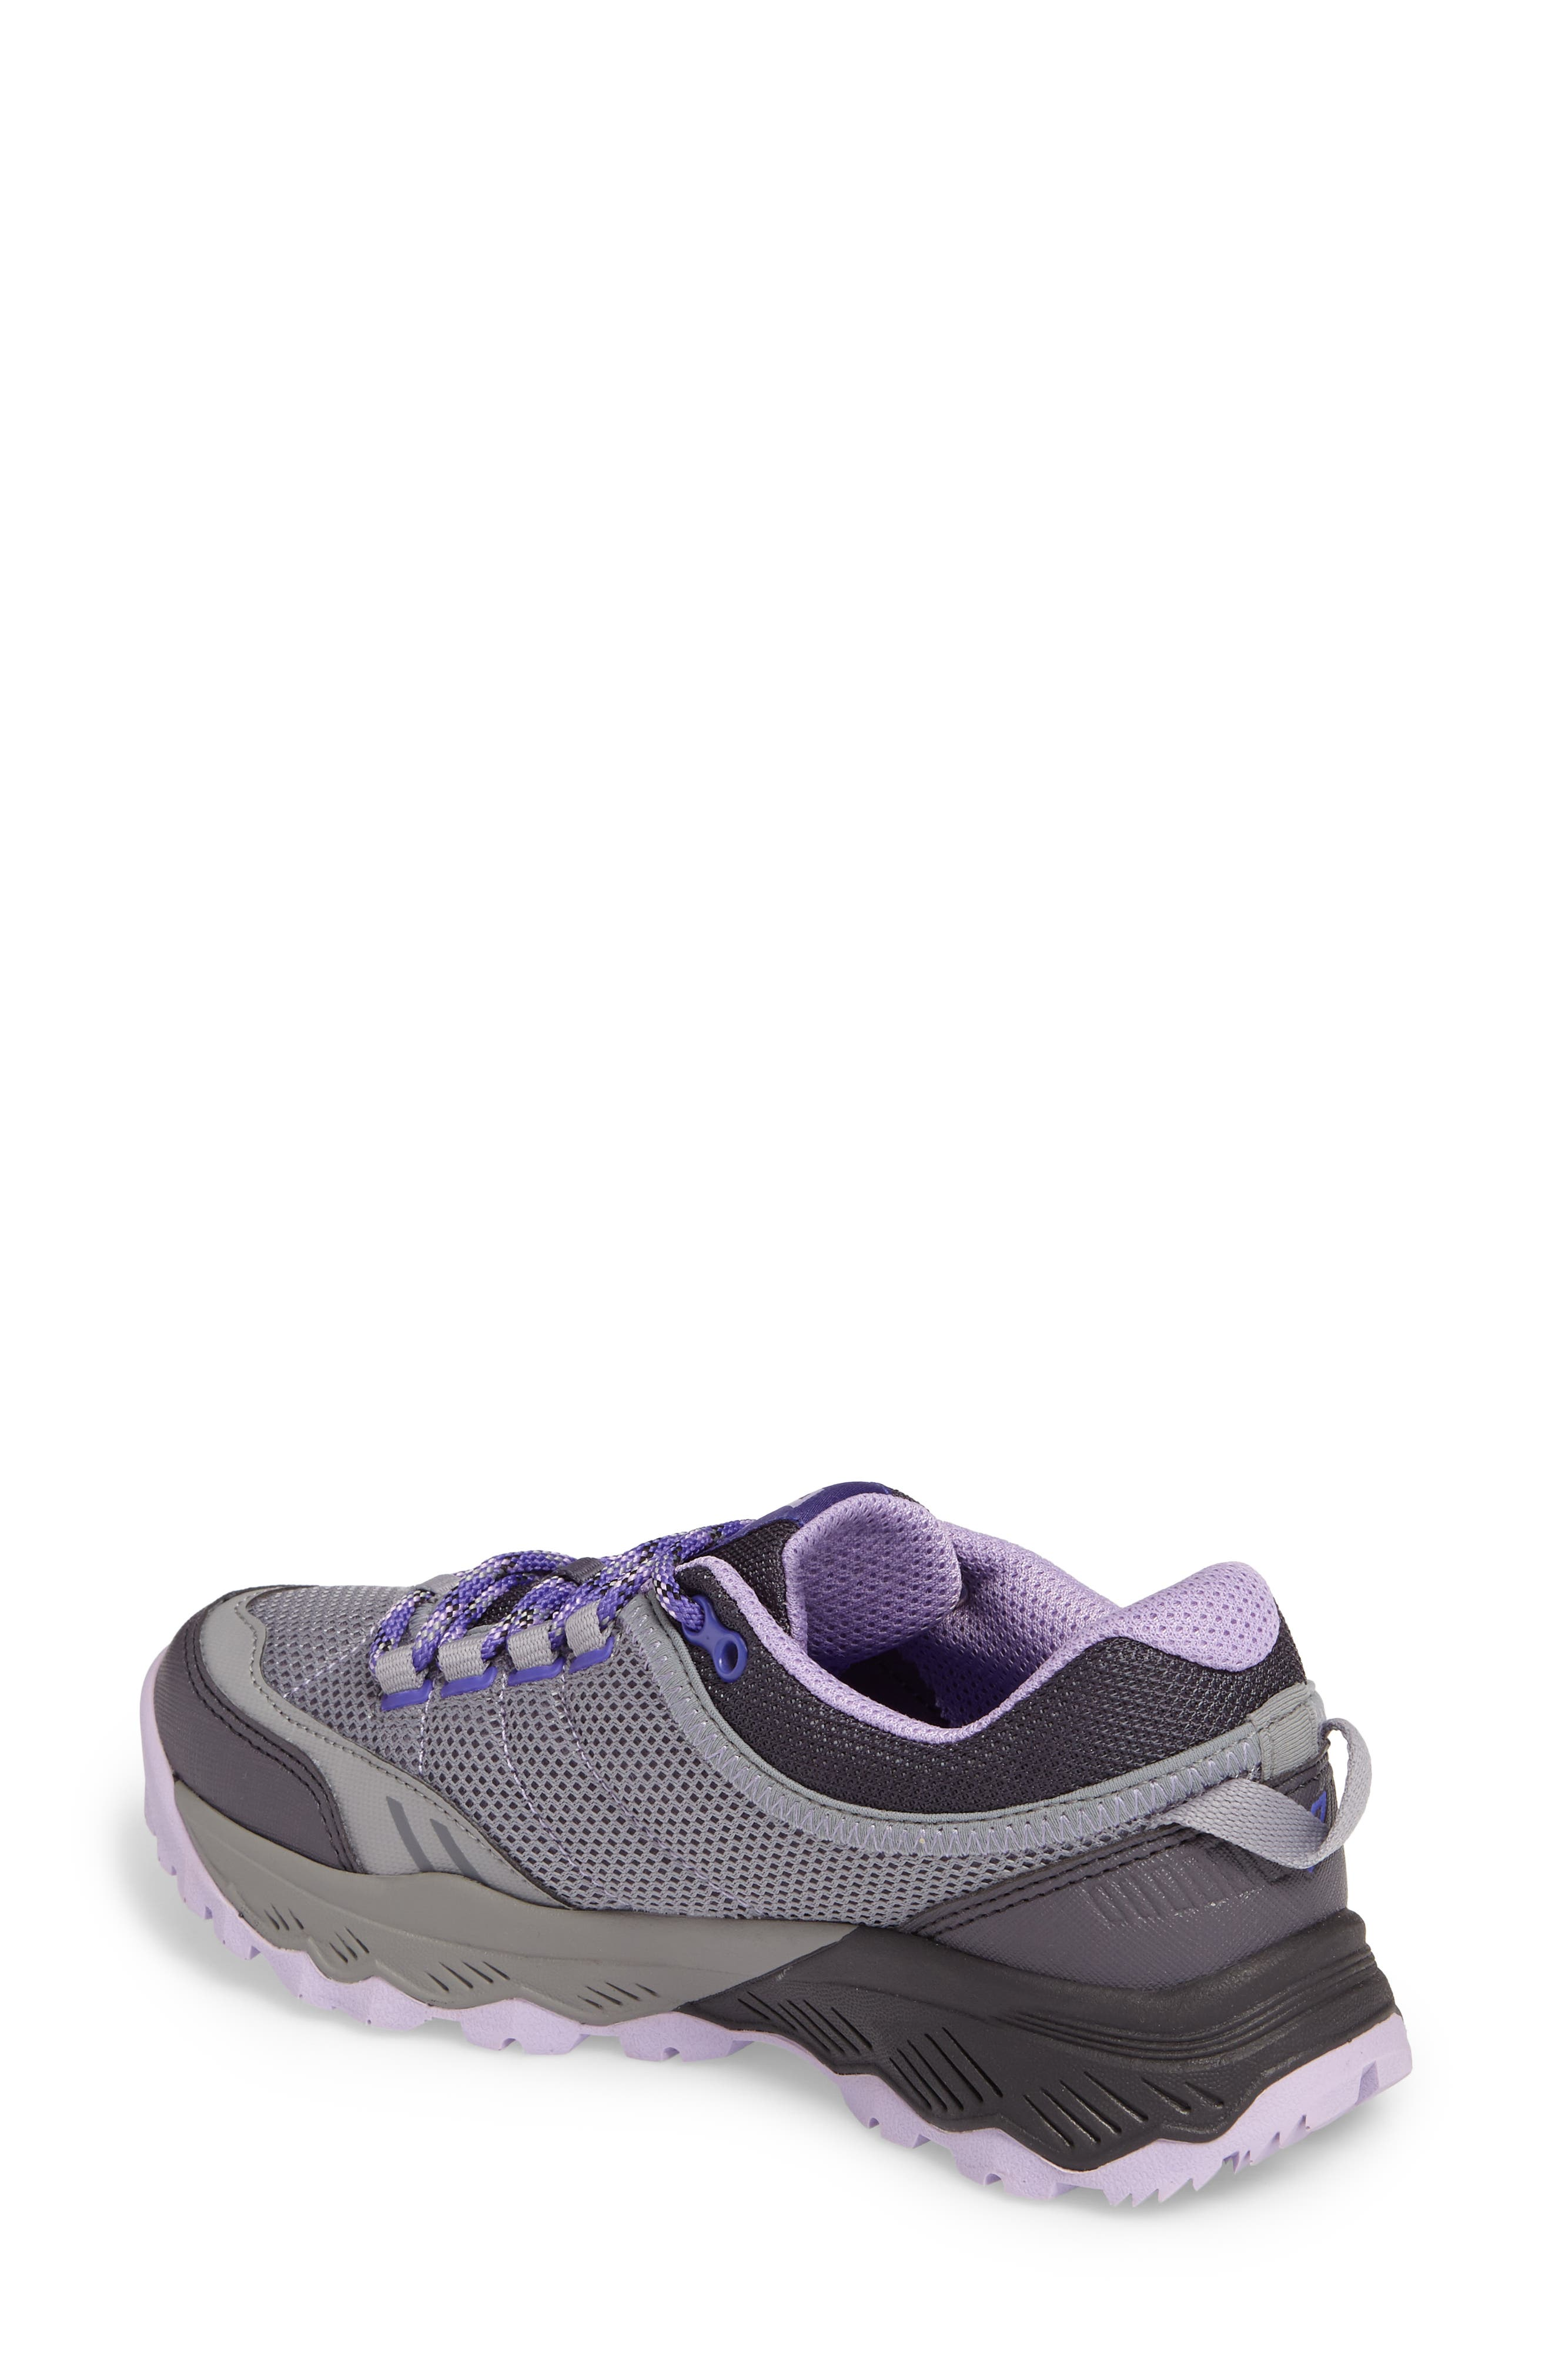 Alternate Image 2  - Vionic Mckinley Sneaker (Women)